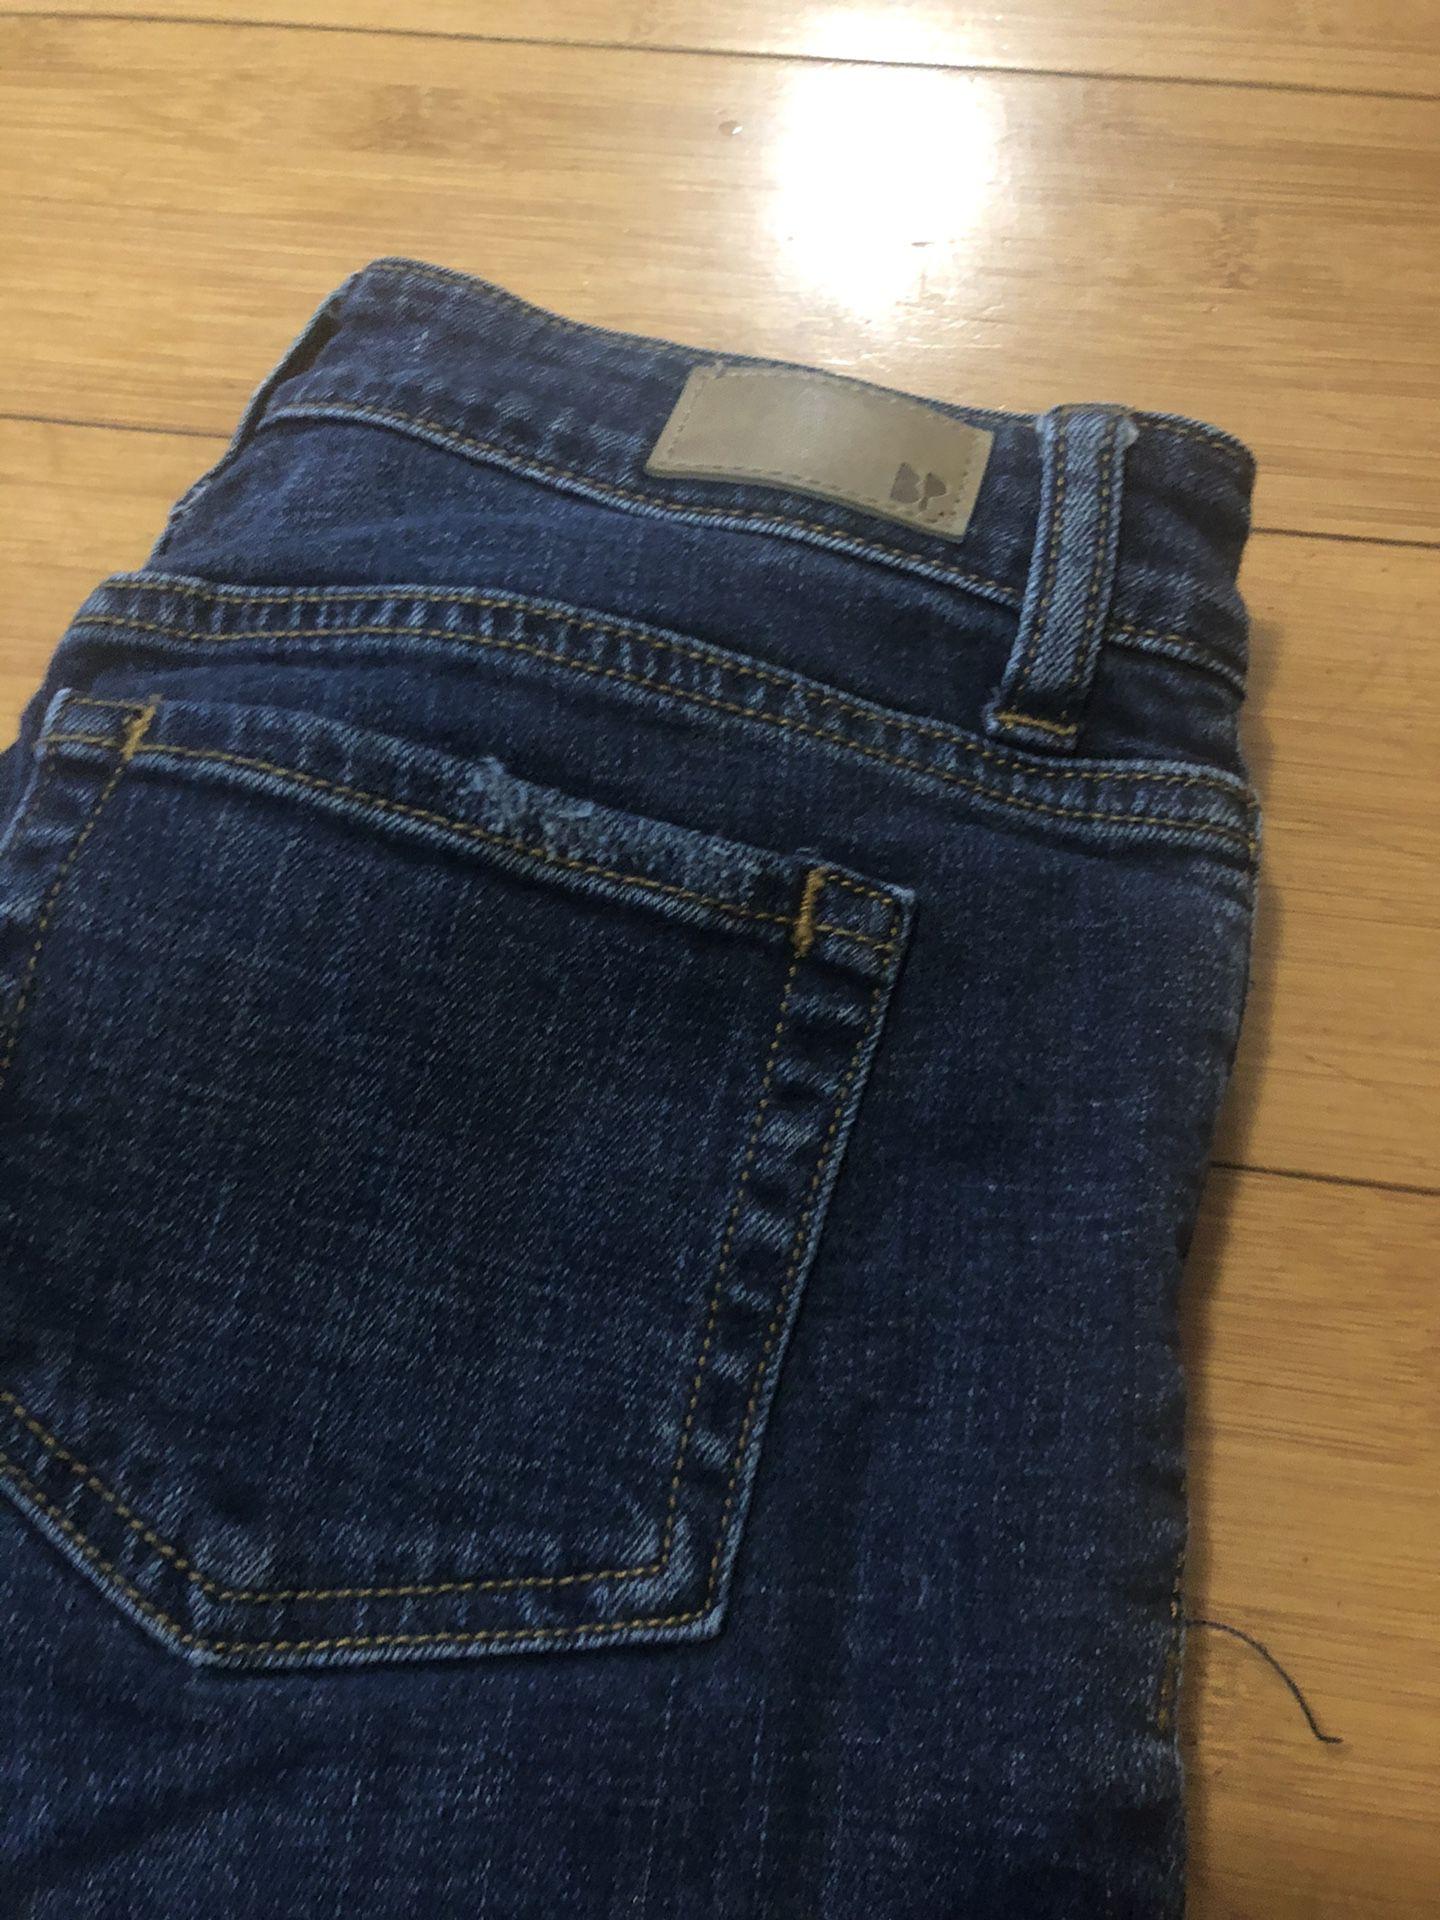 Women's jeans size 24 (size 0)